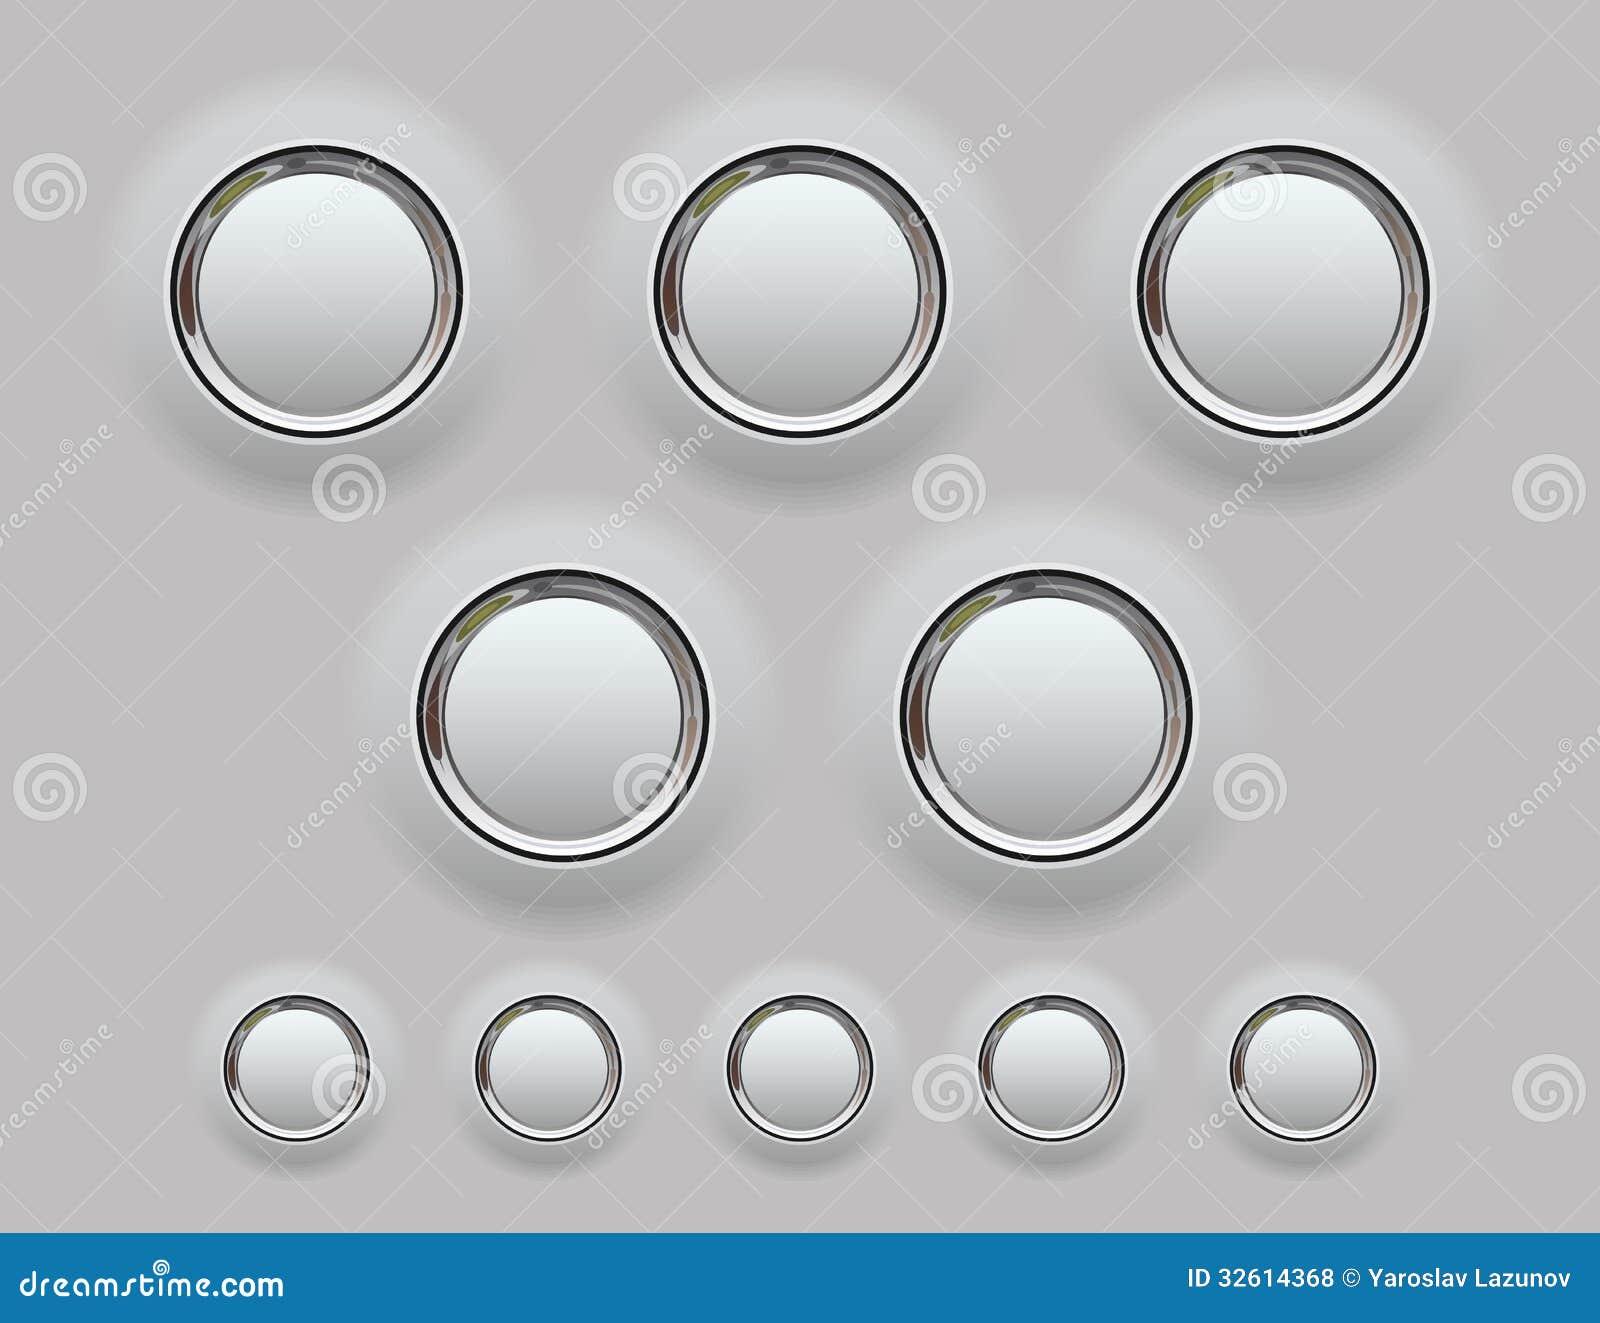 Vector Illustration Web Designs: Web Metal Button. Vector Illustration Stock Vector